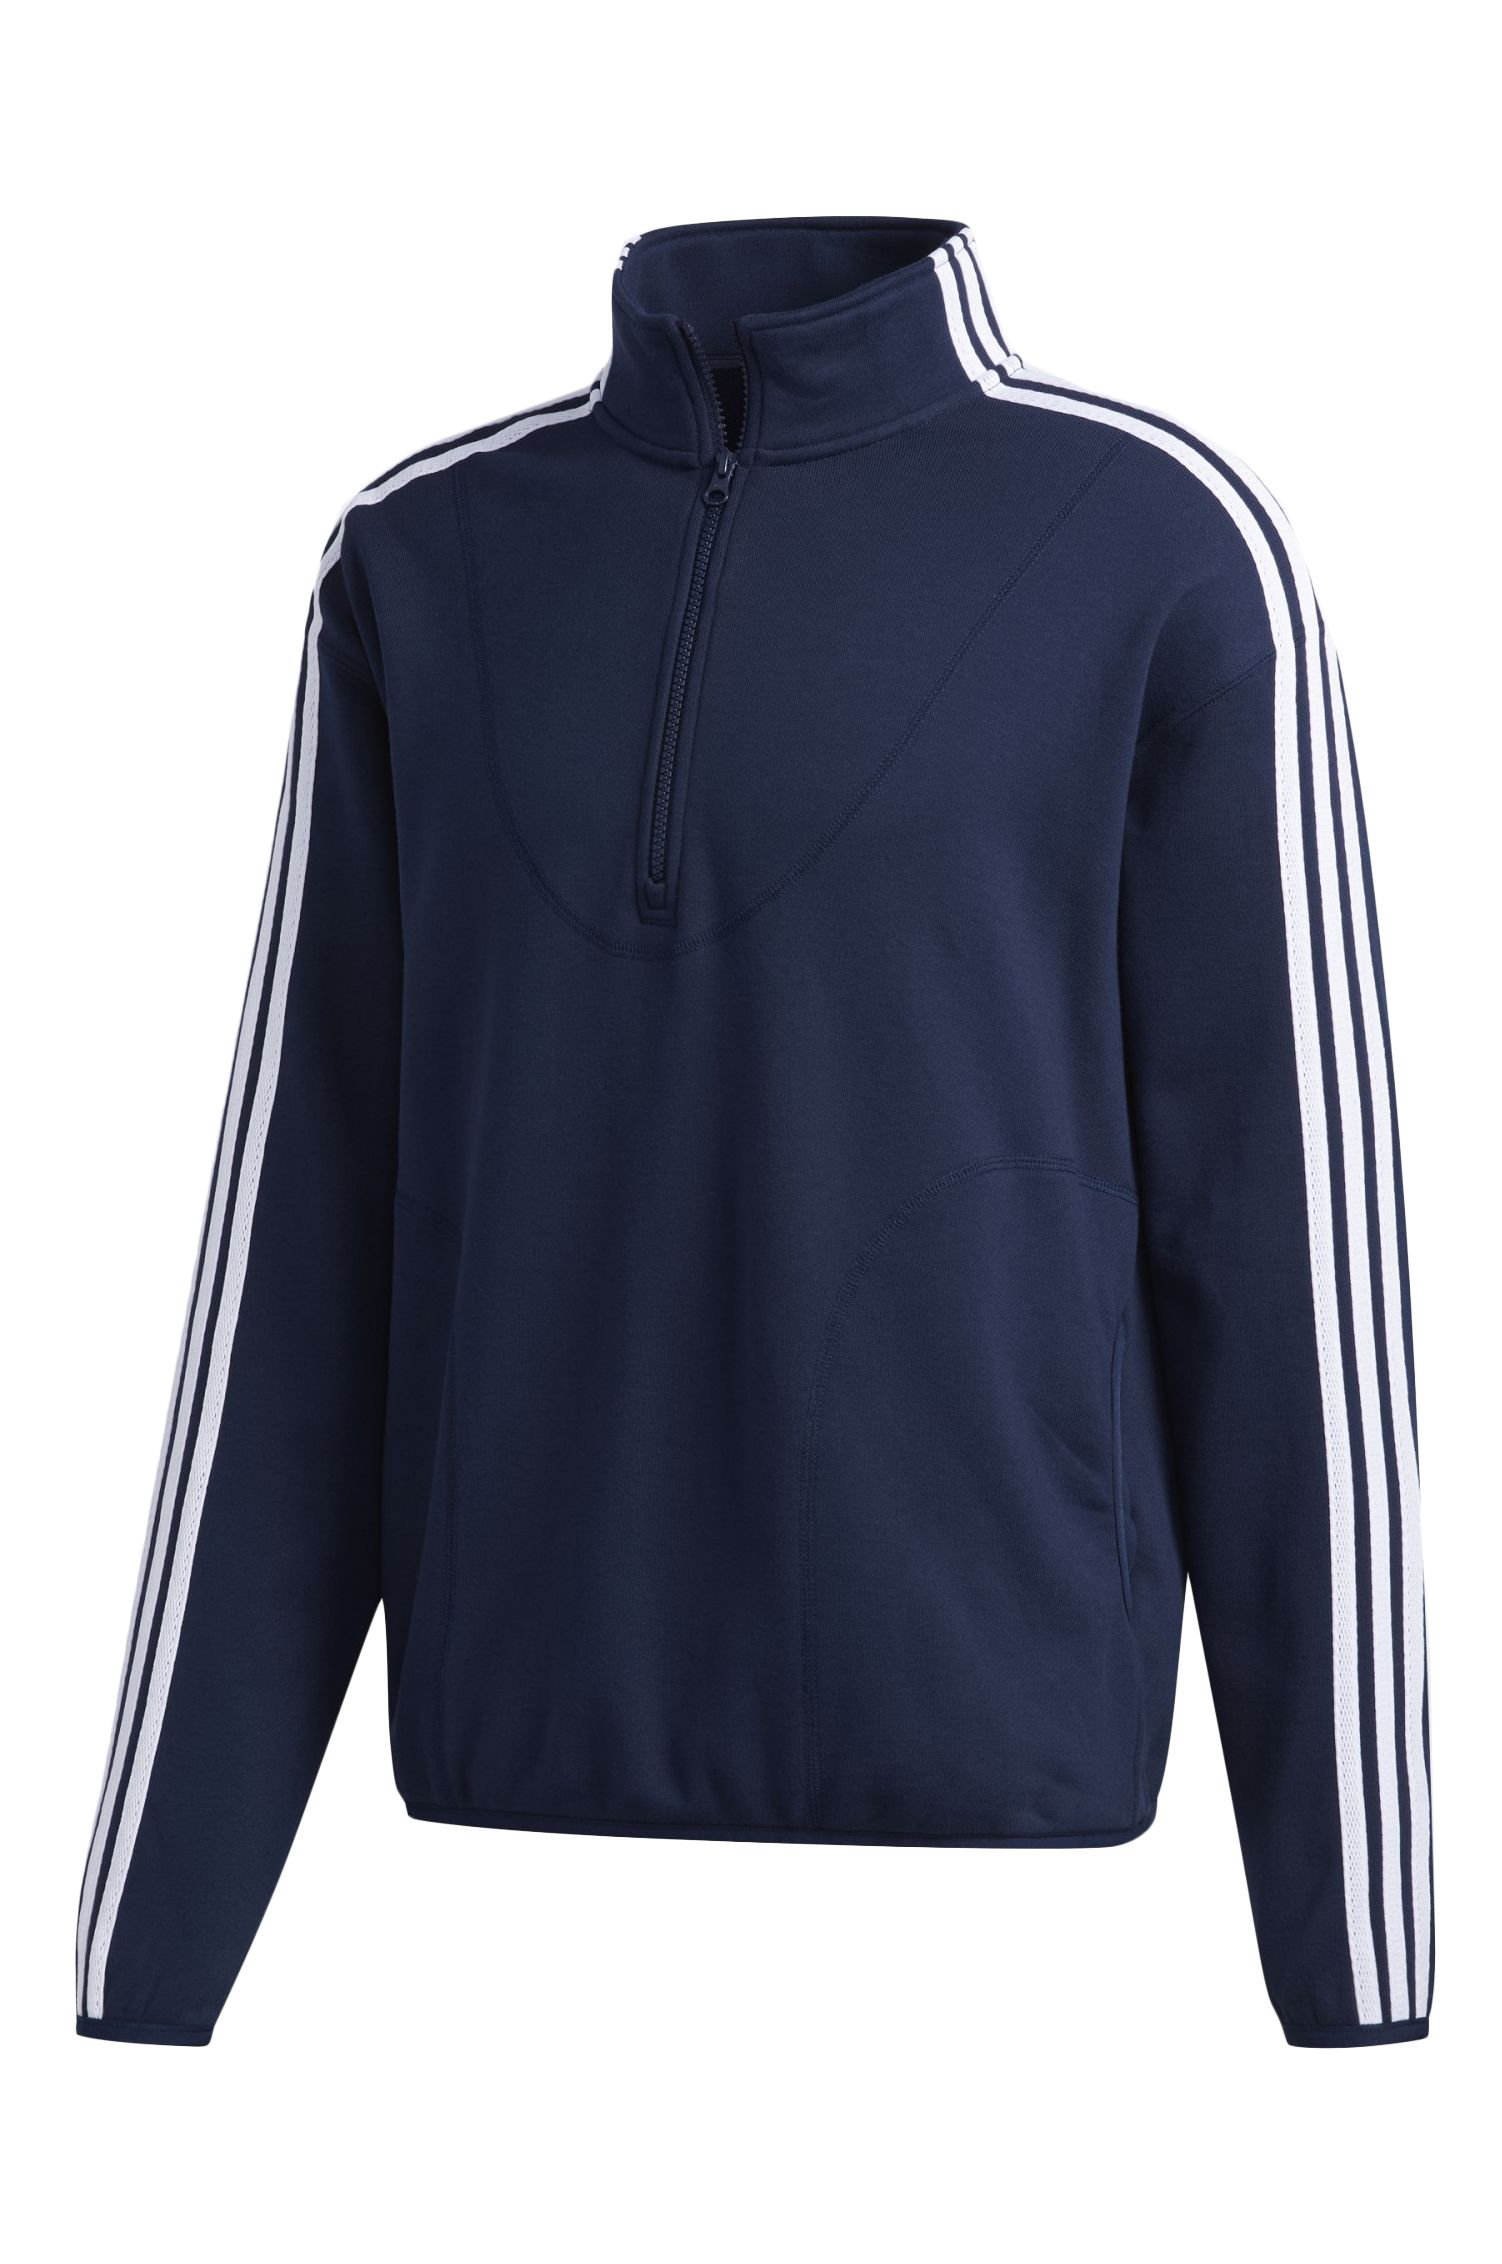 Casaco Adidas TERRY TT Collegiate Navy/White